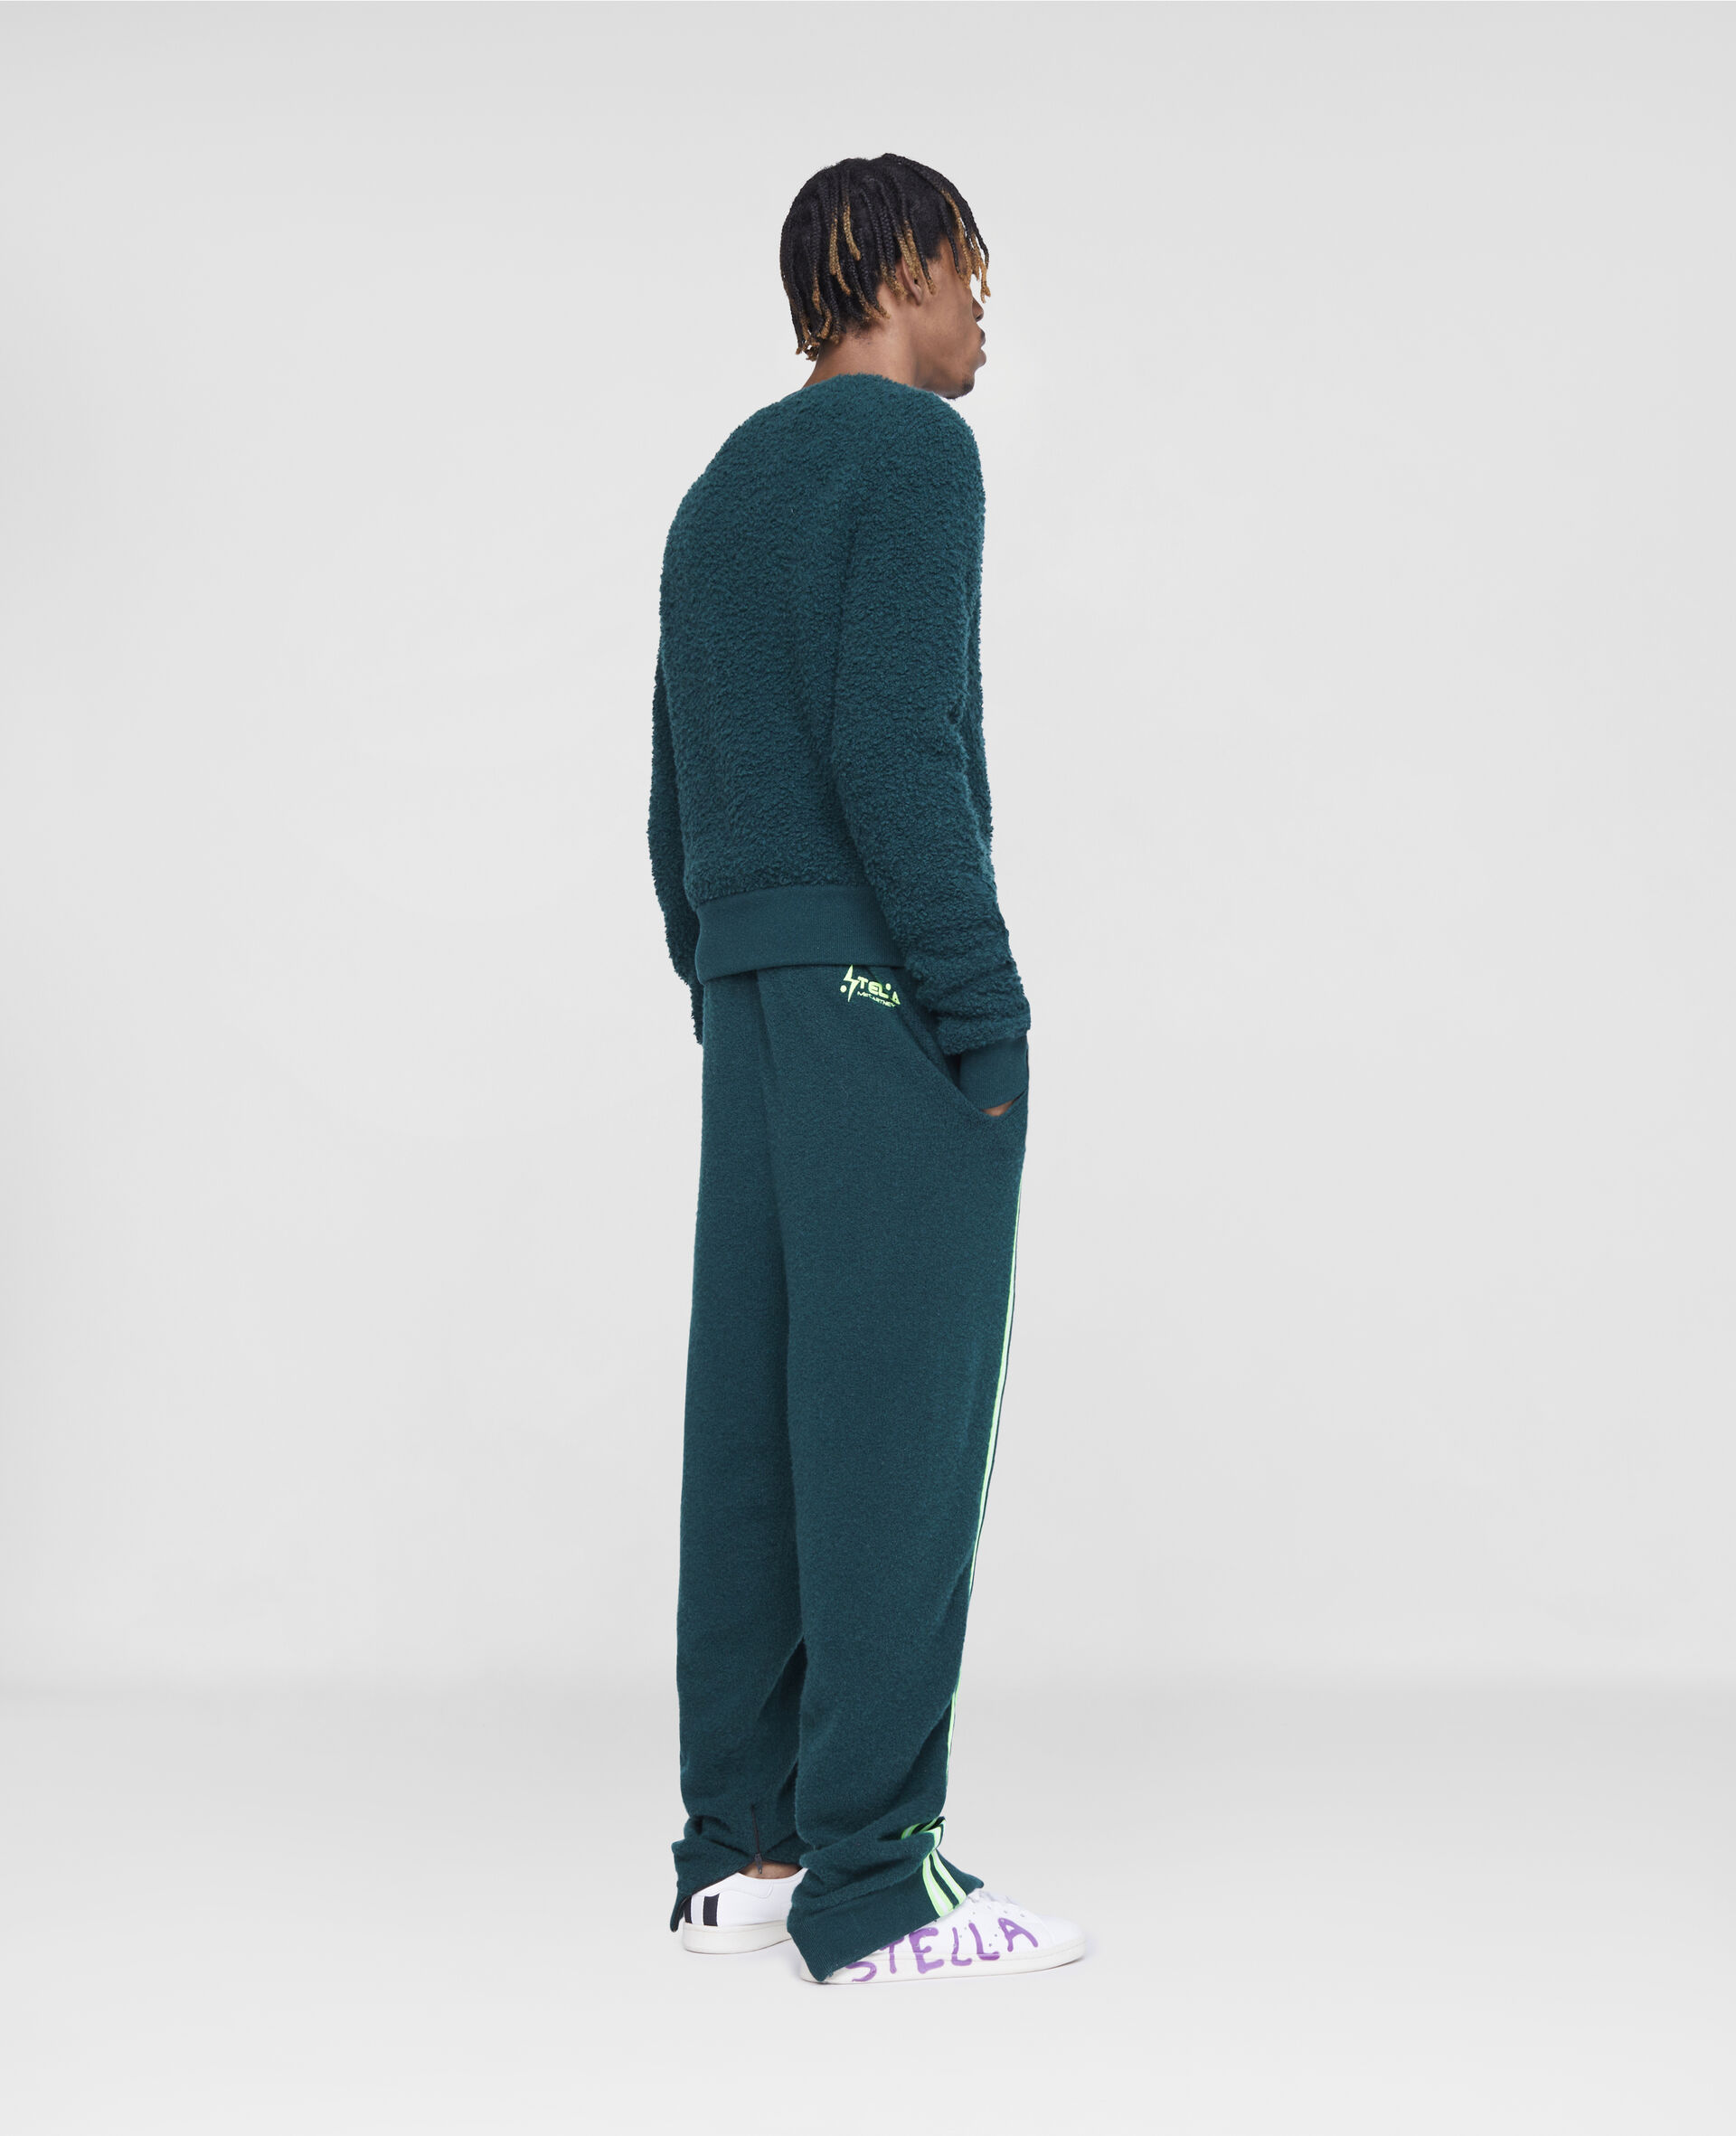 Pantaloni da Training con Logo Stella Tom Tosseyn-Verde-large image number 2